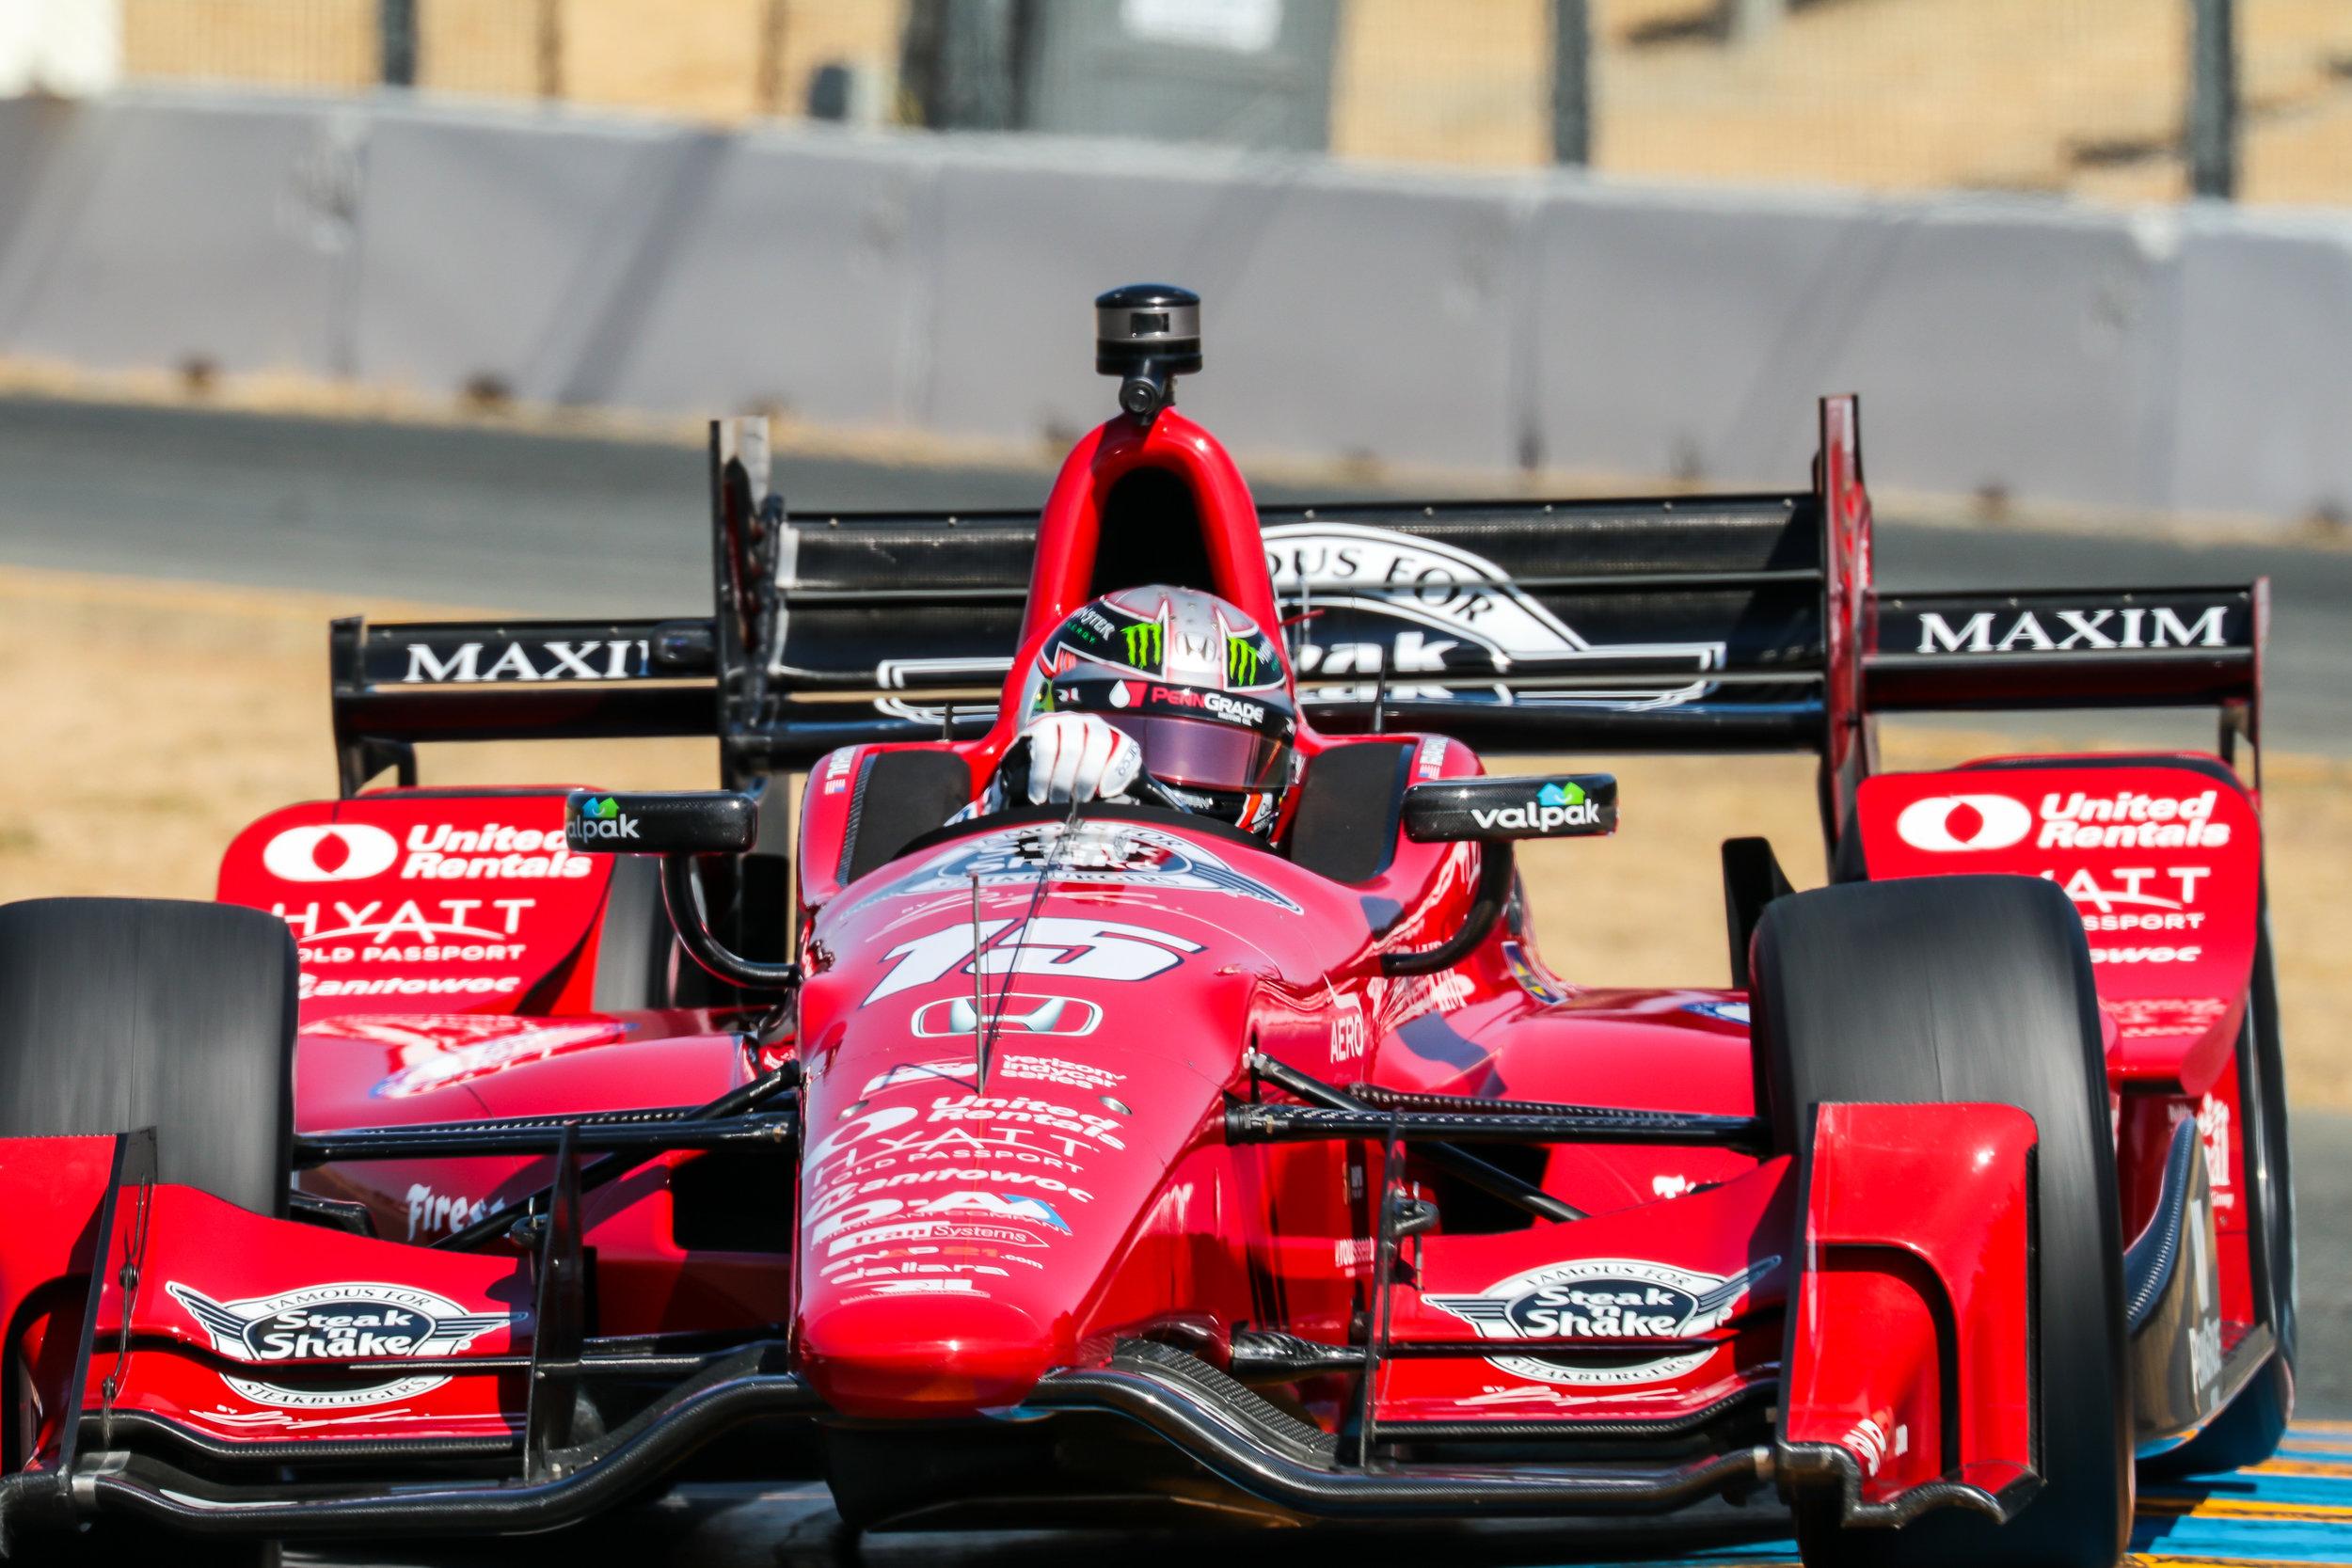 Indy16-2141.jpg